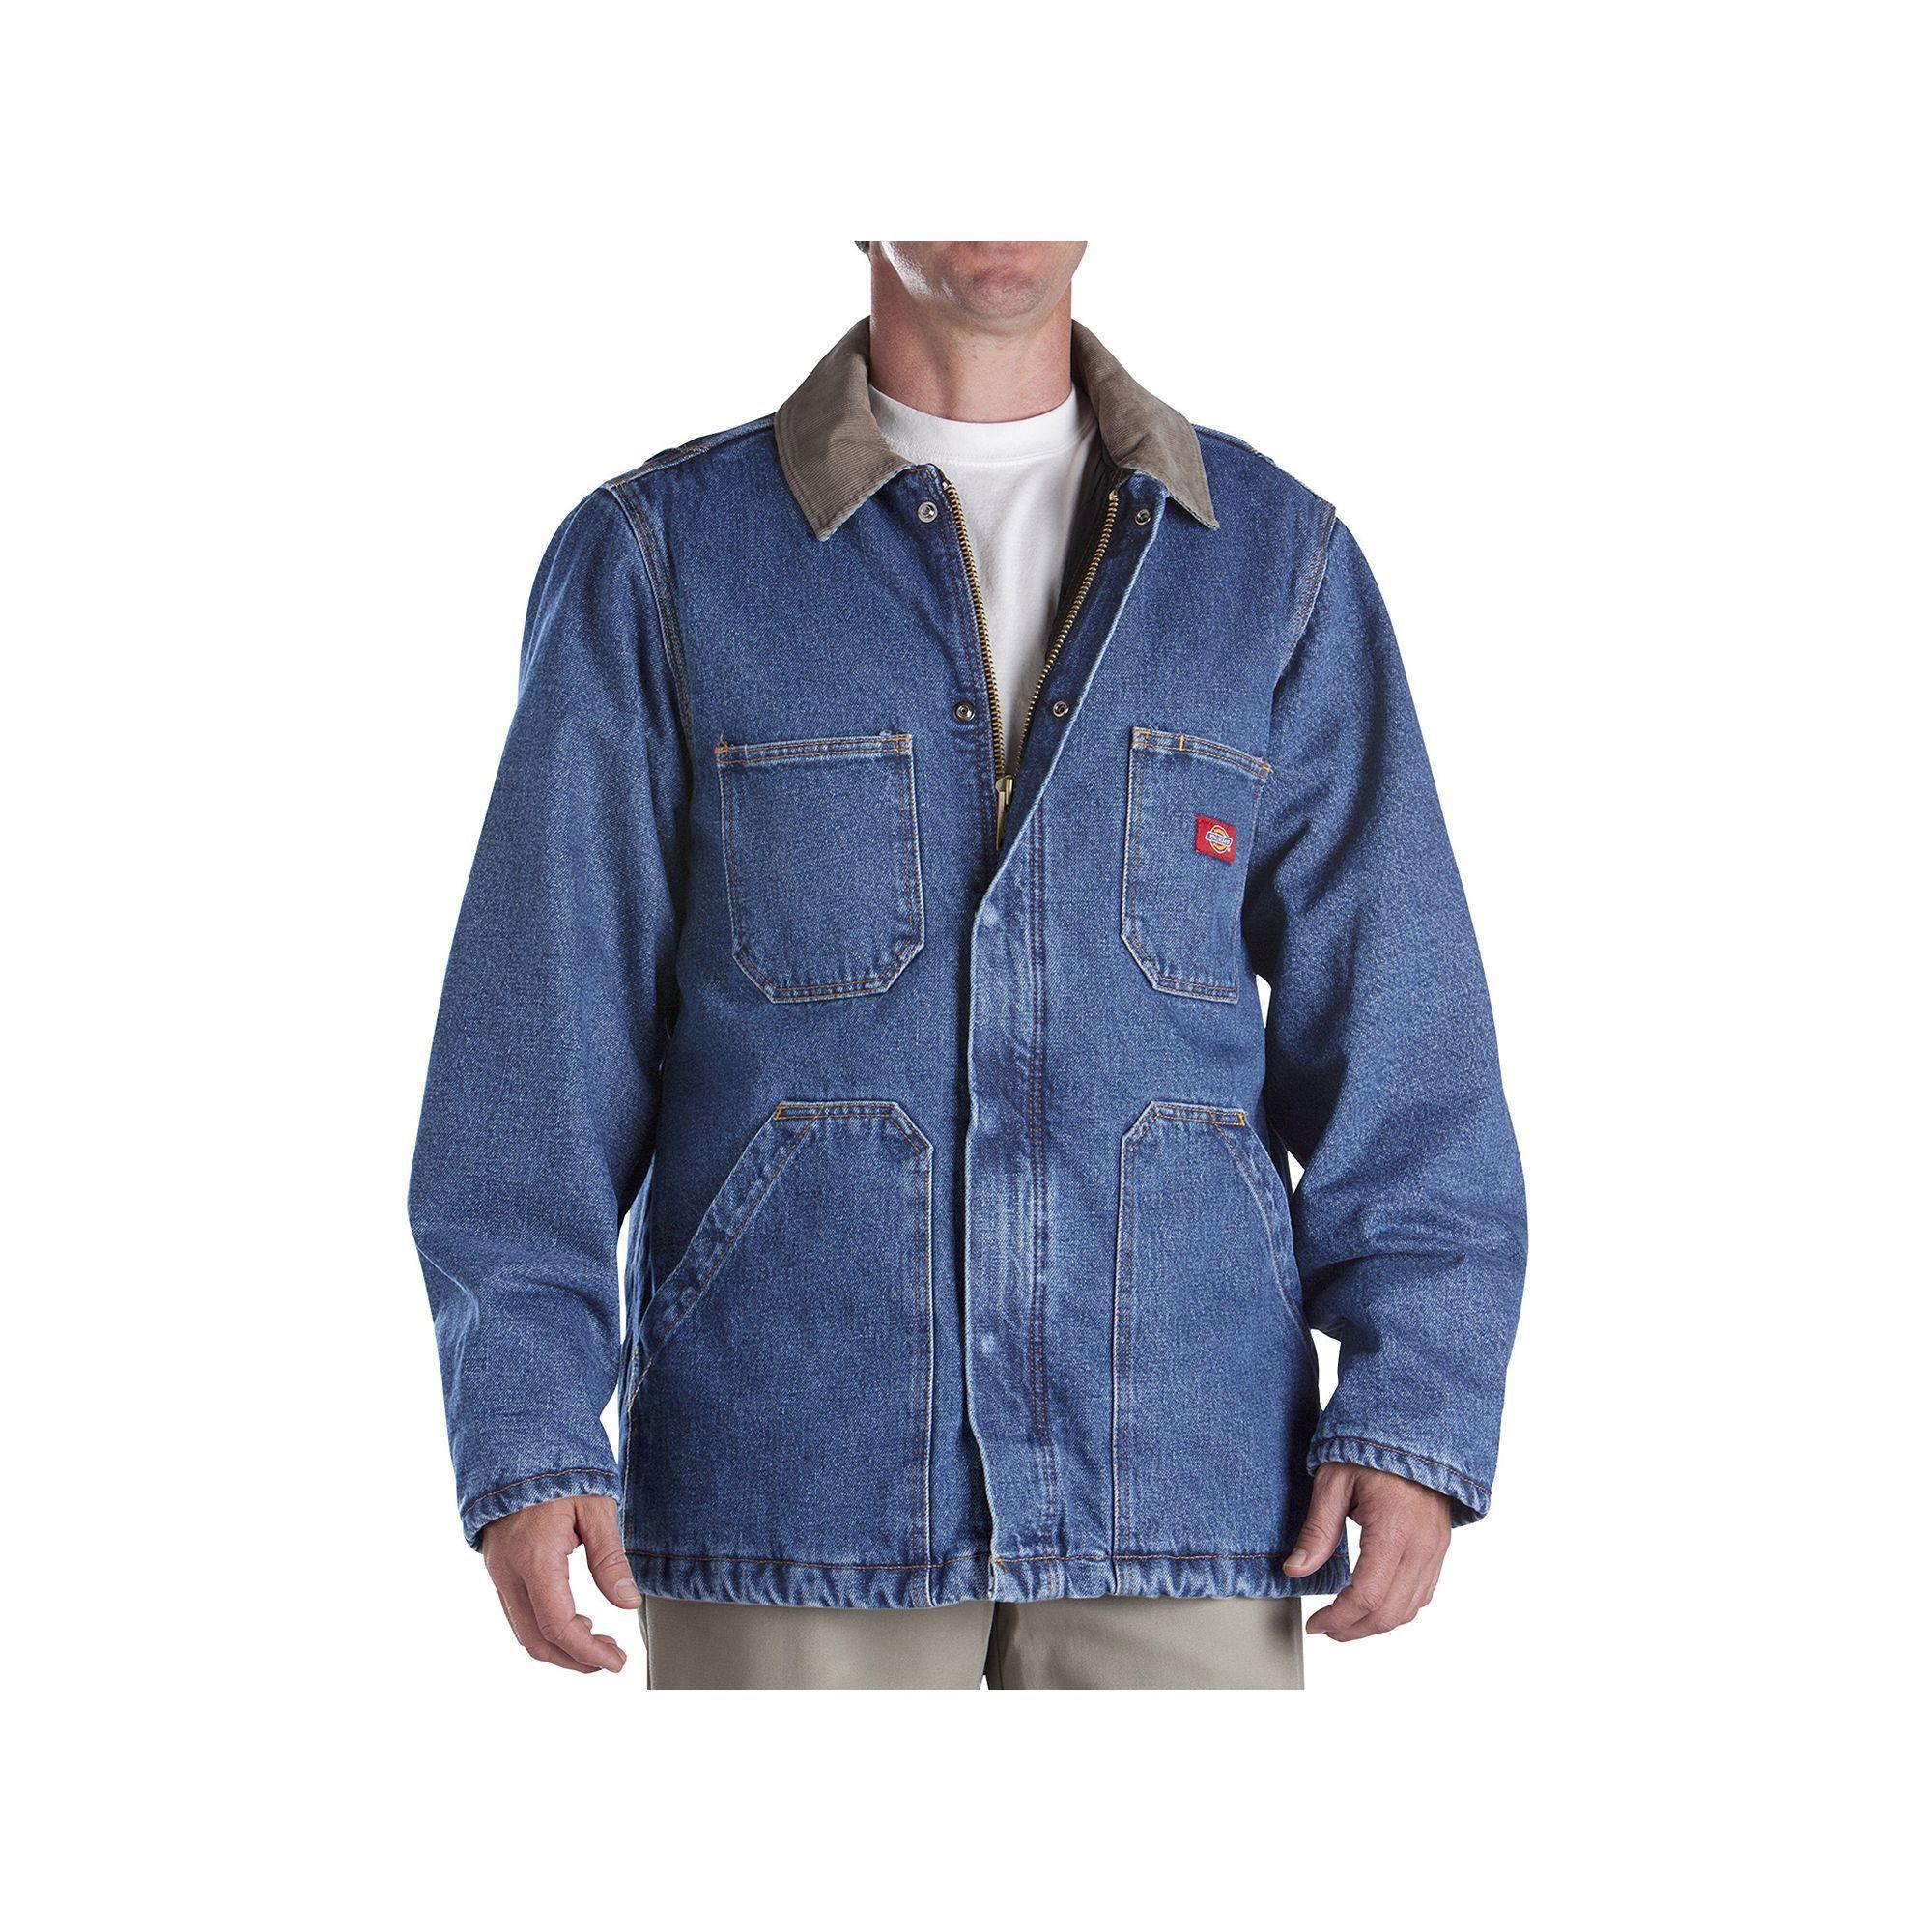 Men's Dickies Denim Chore Jacket, Size: Medium, Blue